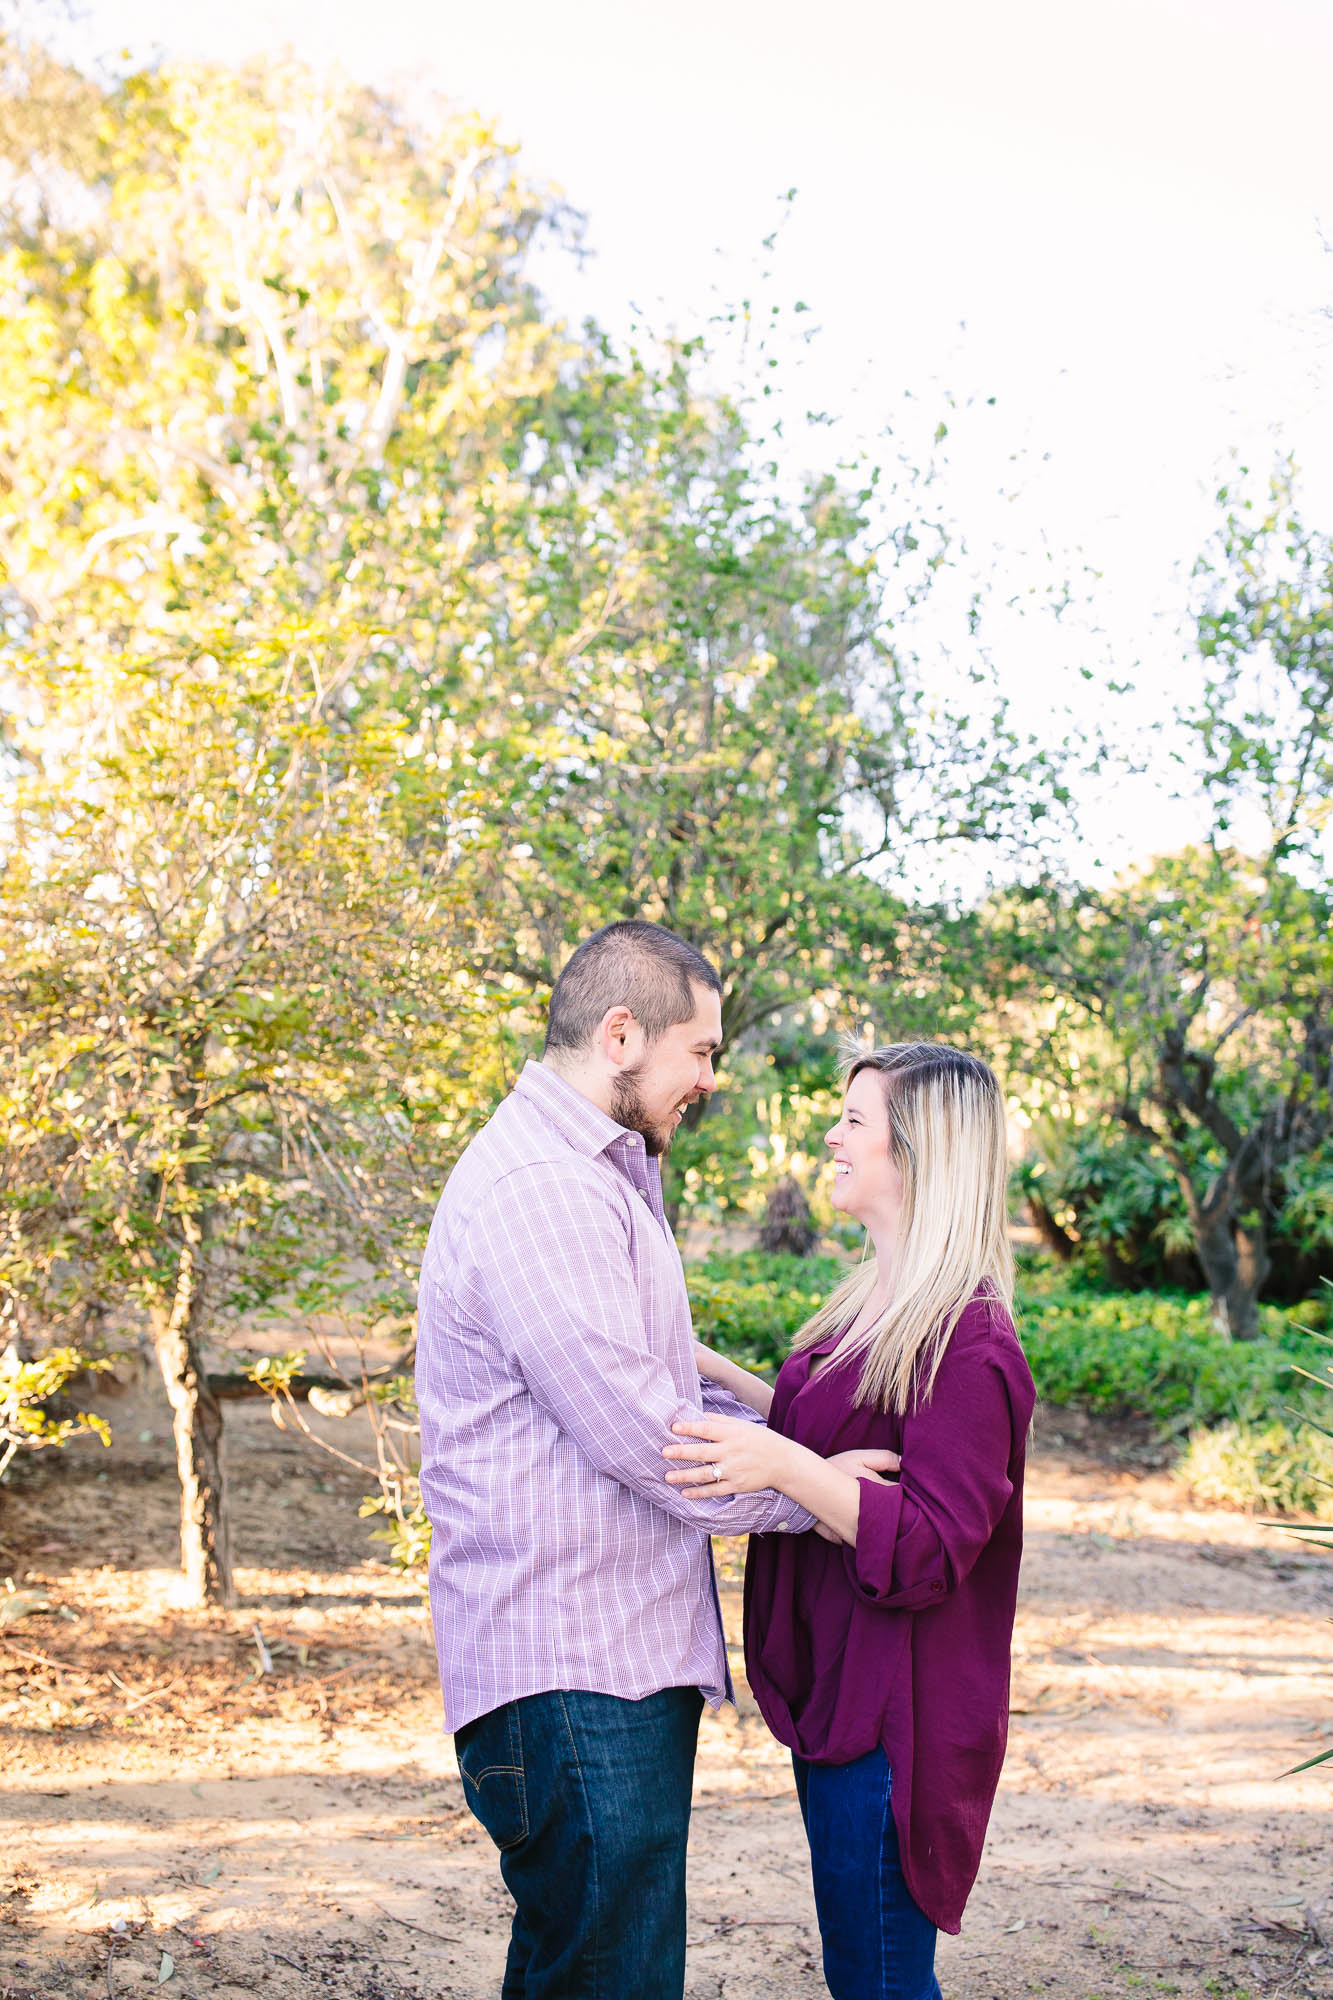 Becca_Mark_Balboa_Engagement_Session_017.jpg